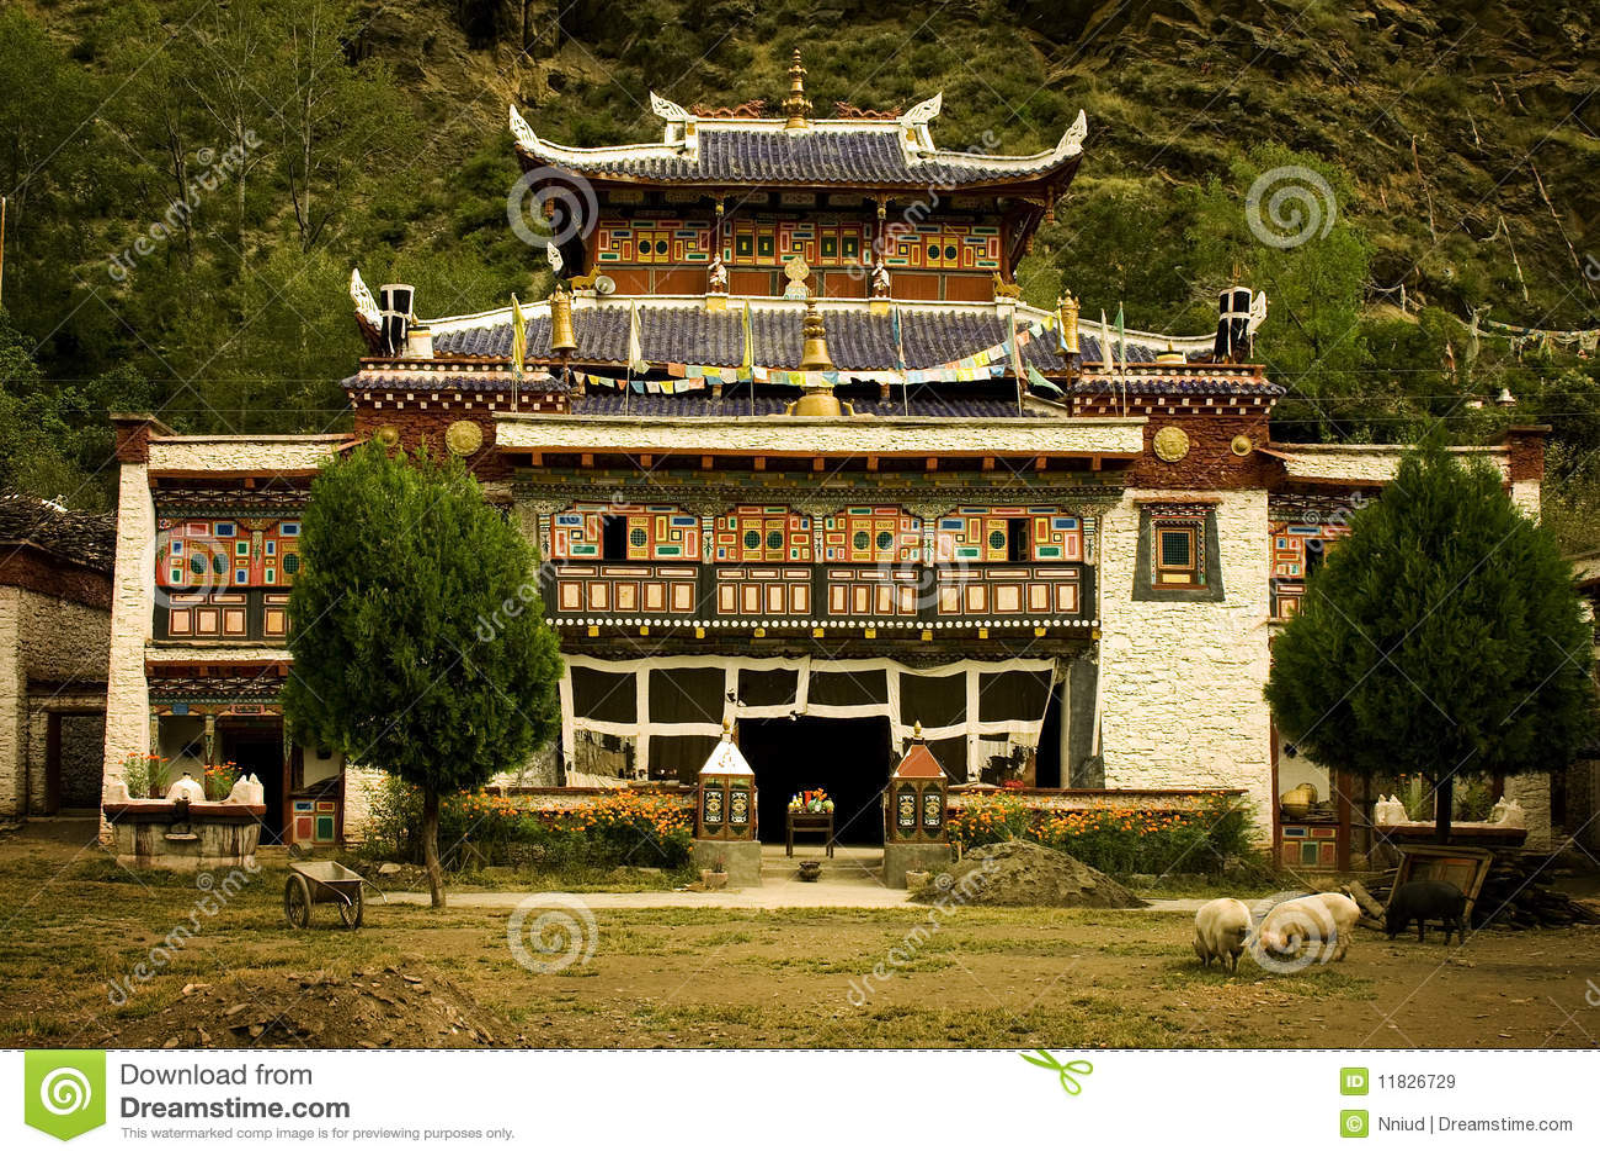 Buddhist temple in tibet, nature all around